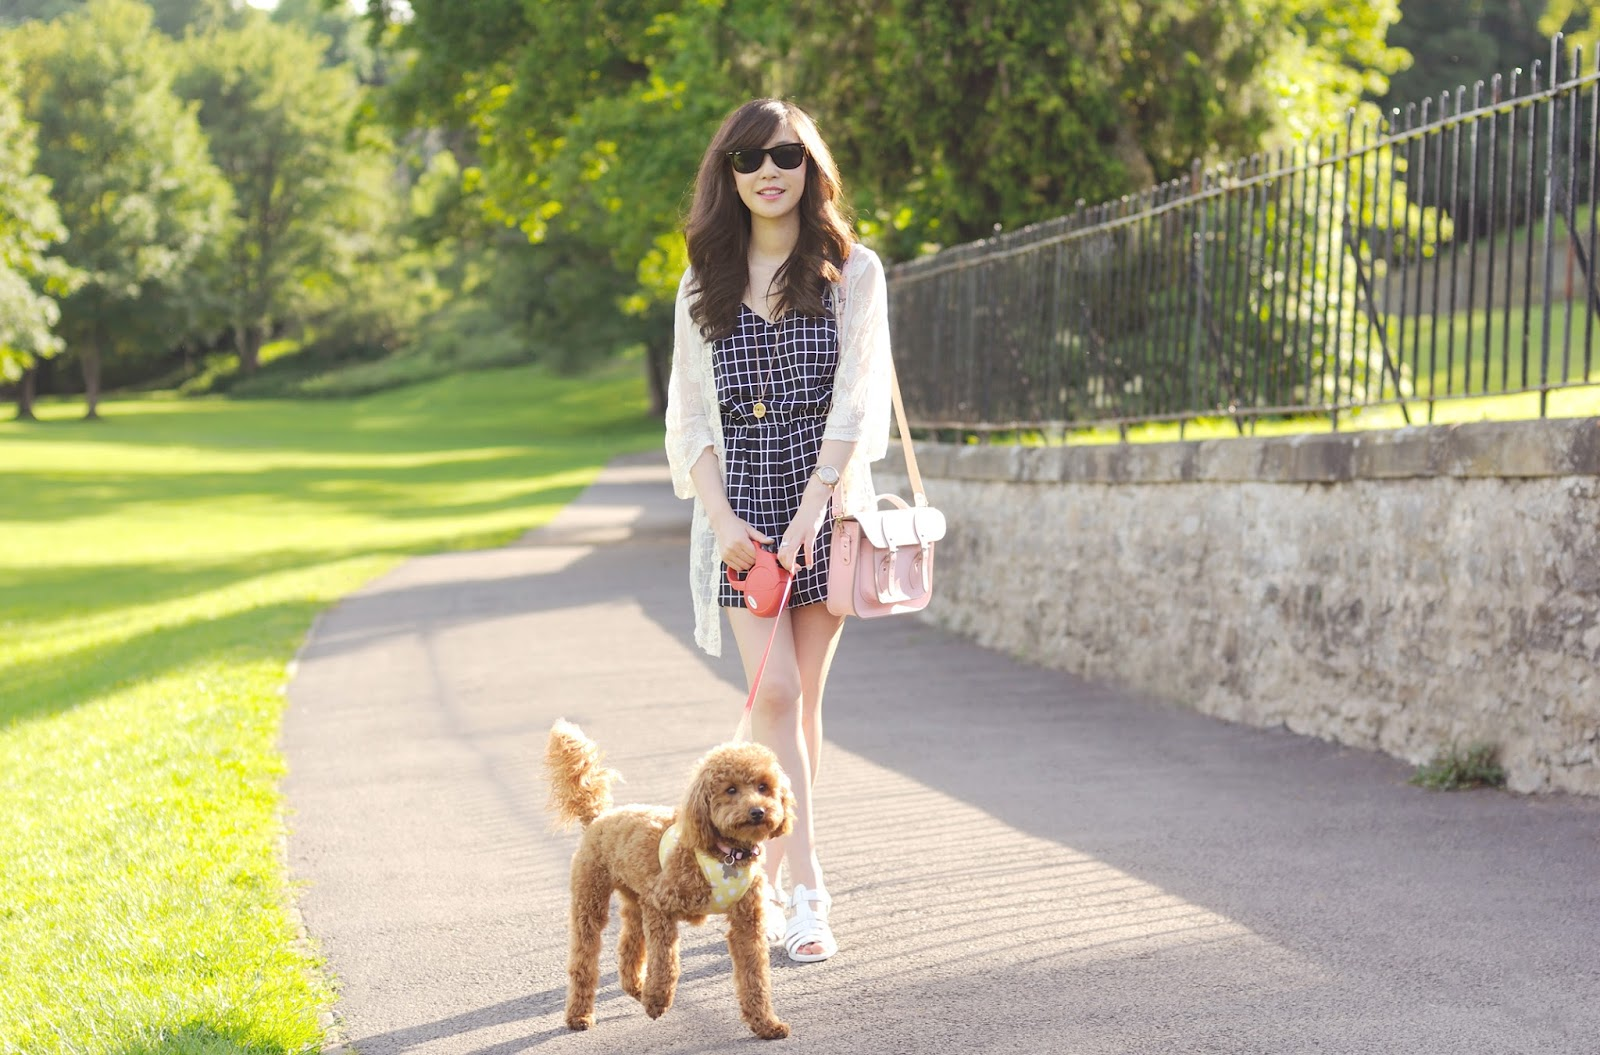 uk fashion blogger, personal style blogger